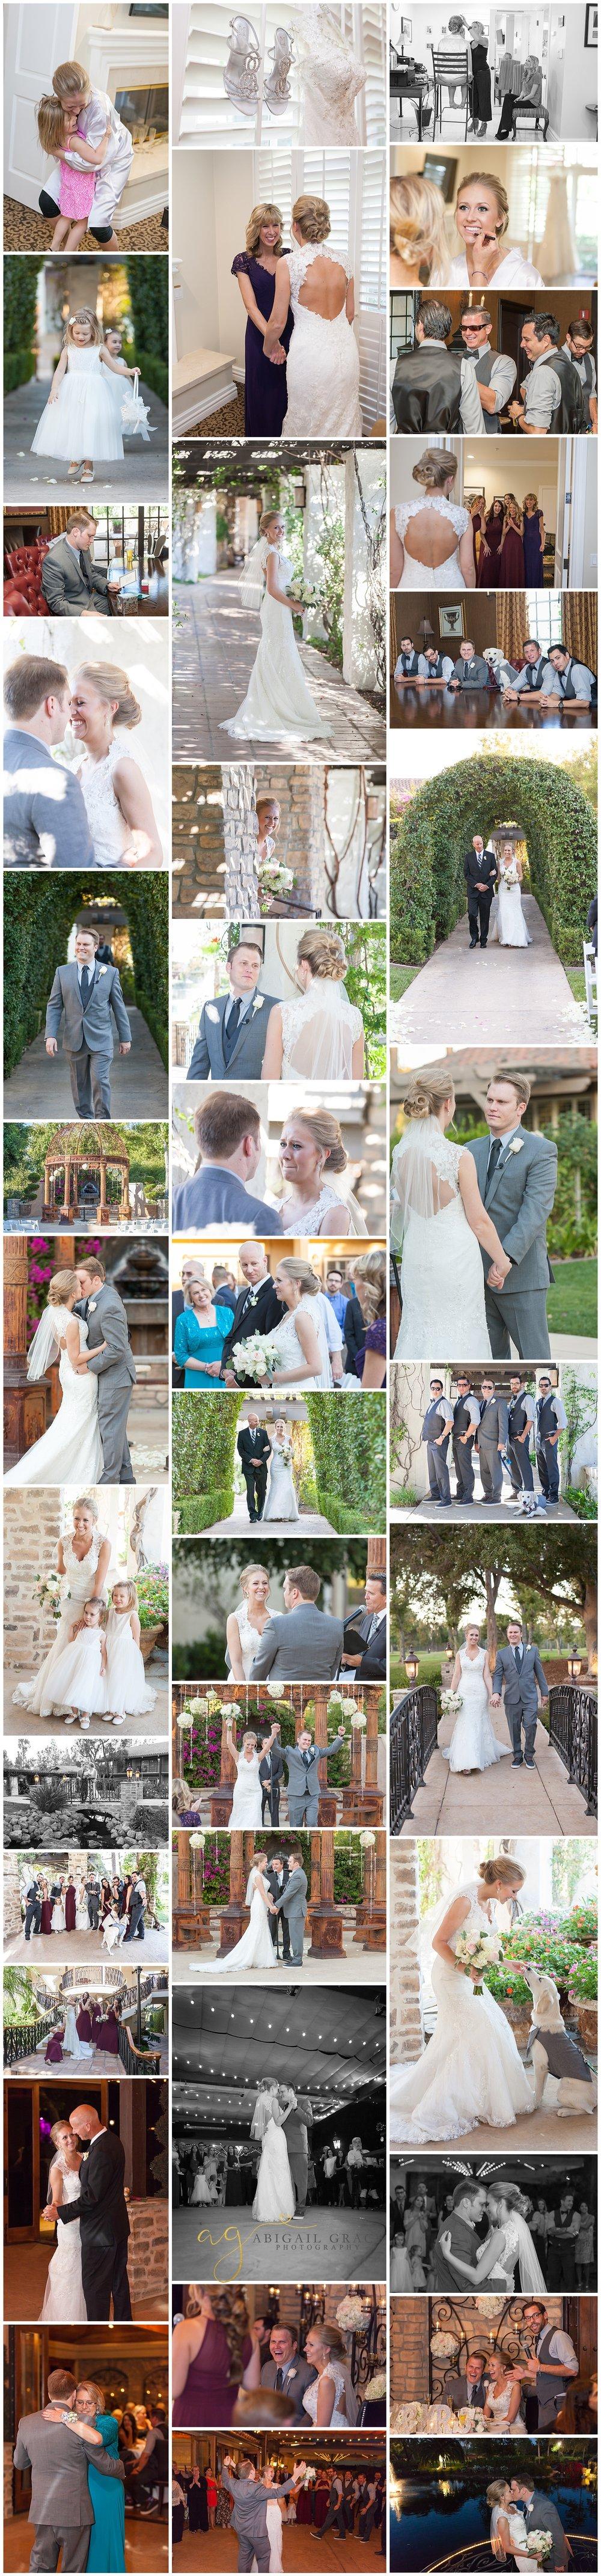 westlake village inn wedding photos